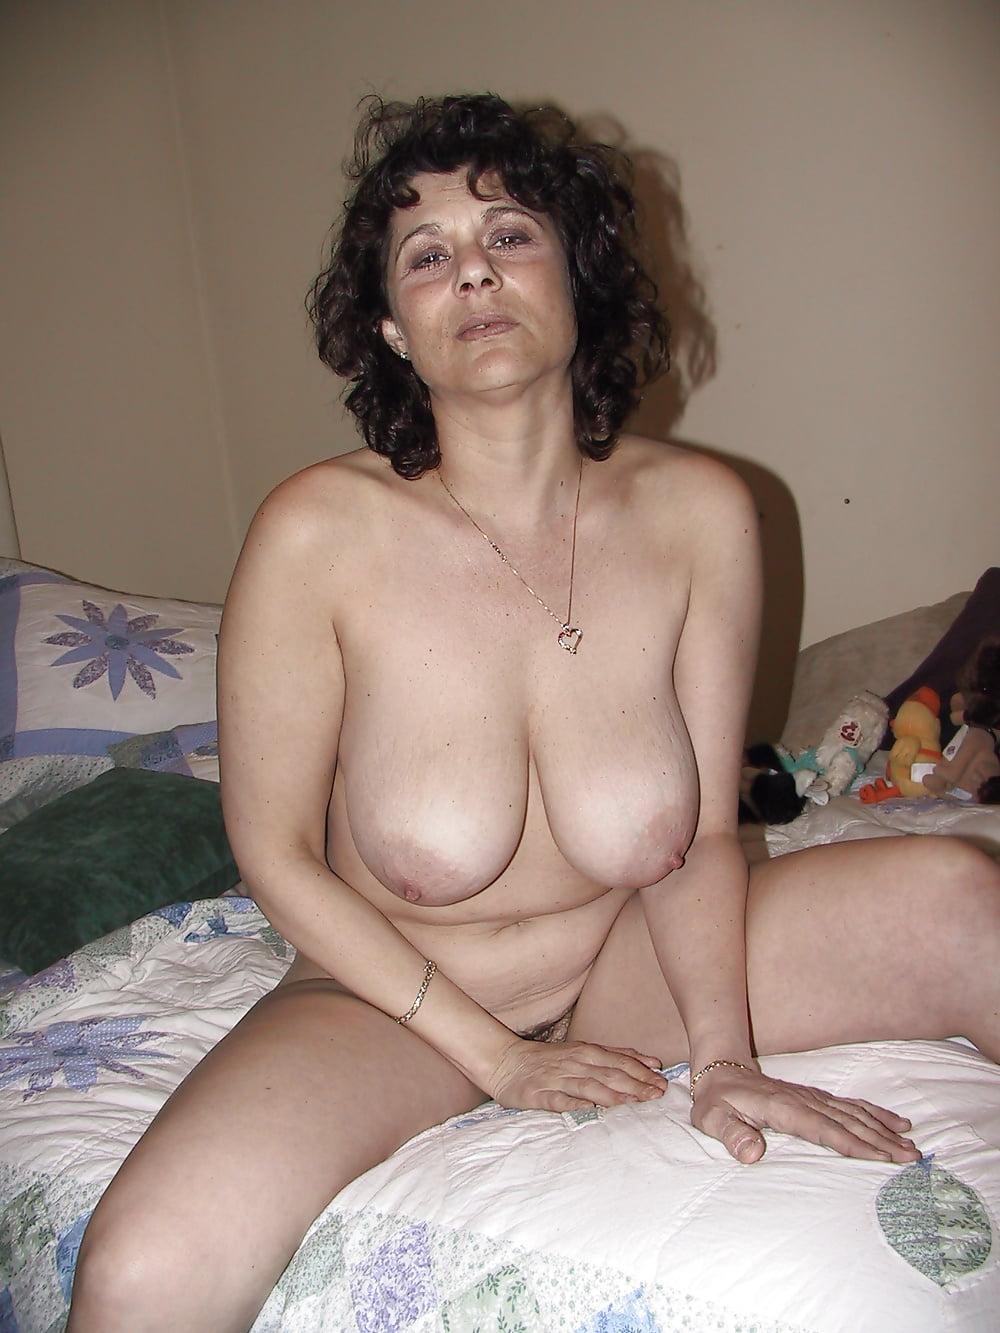 Celeb Tits Nude Campbellsville Kentucky Scenes